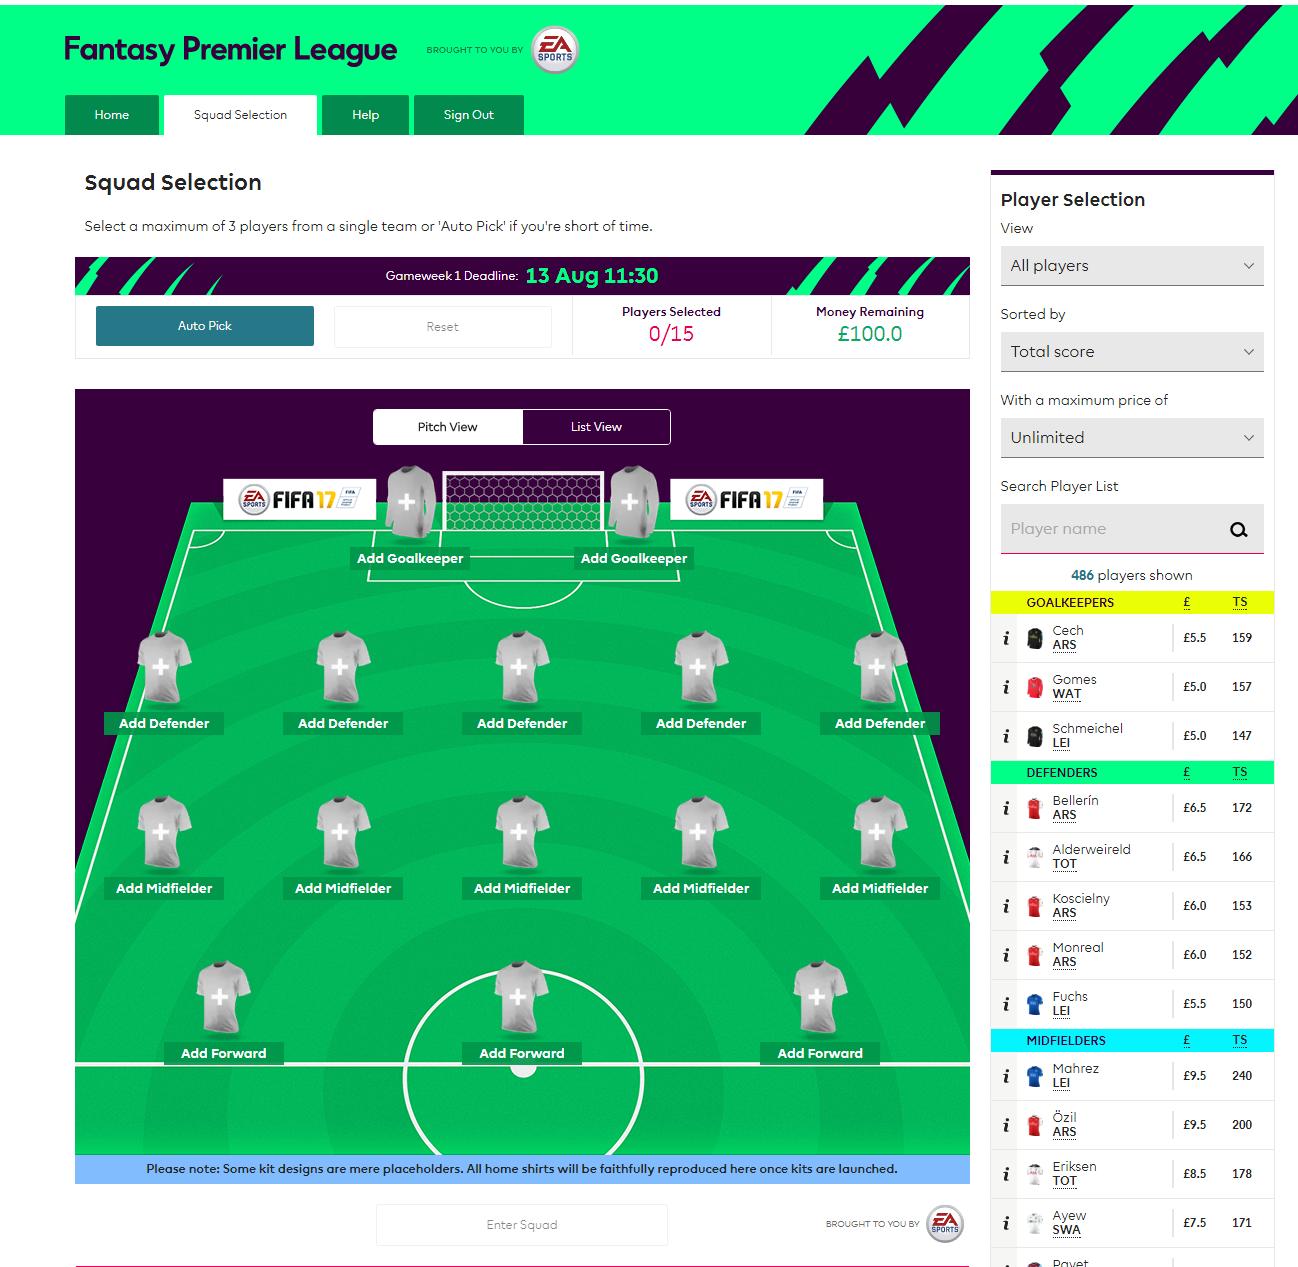 Cara Mendaftar Fantasy Premier League - Liverpool Indonesia Fans Club - LIFC